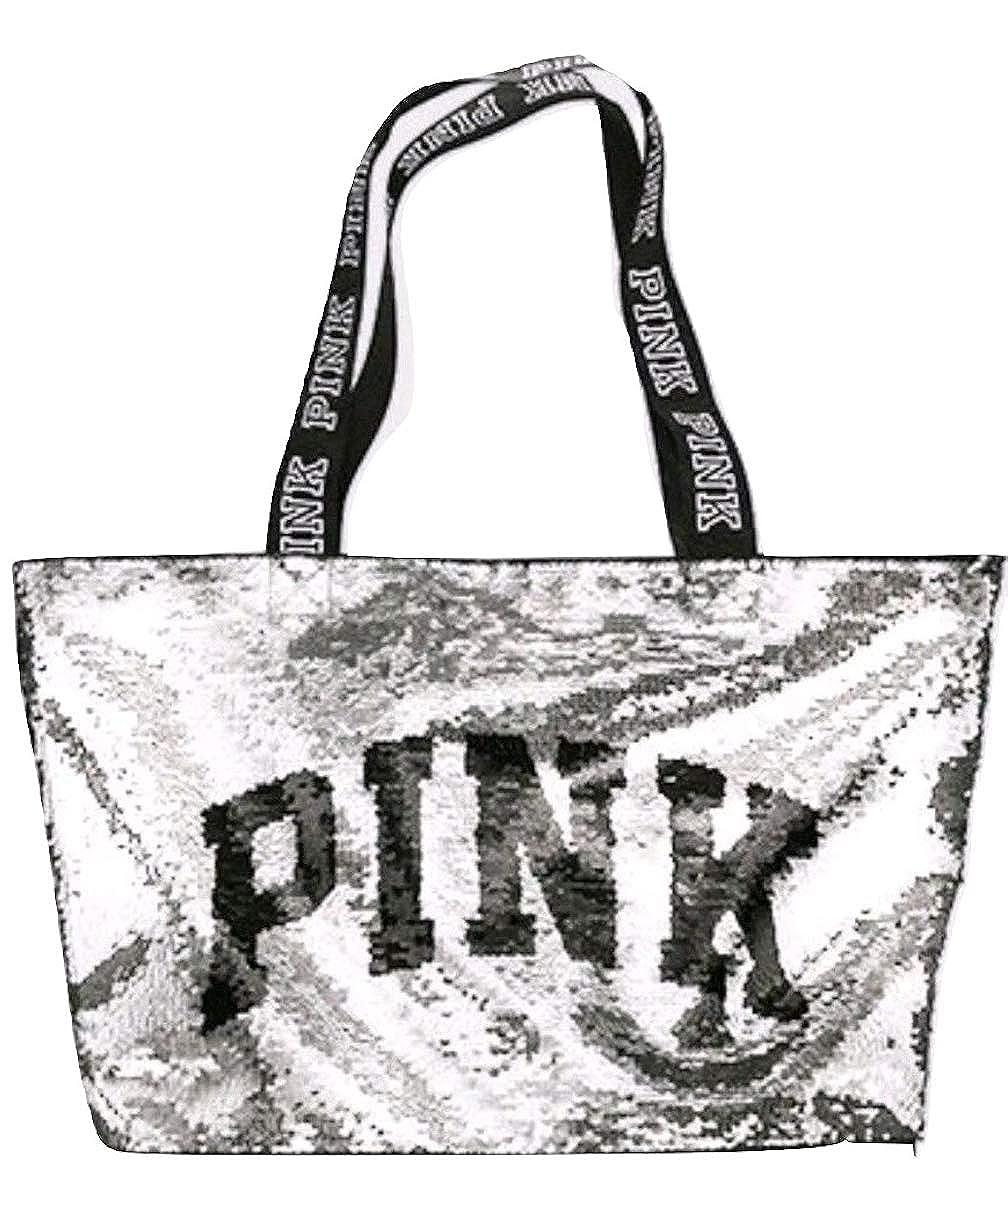 7a035bc3e0166 Amazon.com: Victoria's Secret PINK Black Friday Sequin BlingTote ...